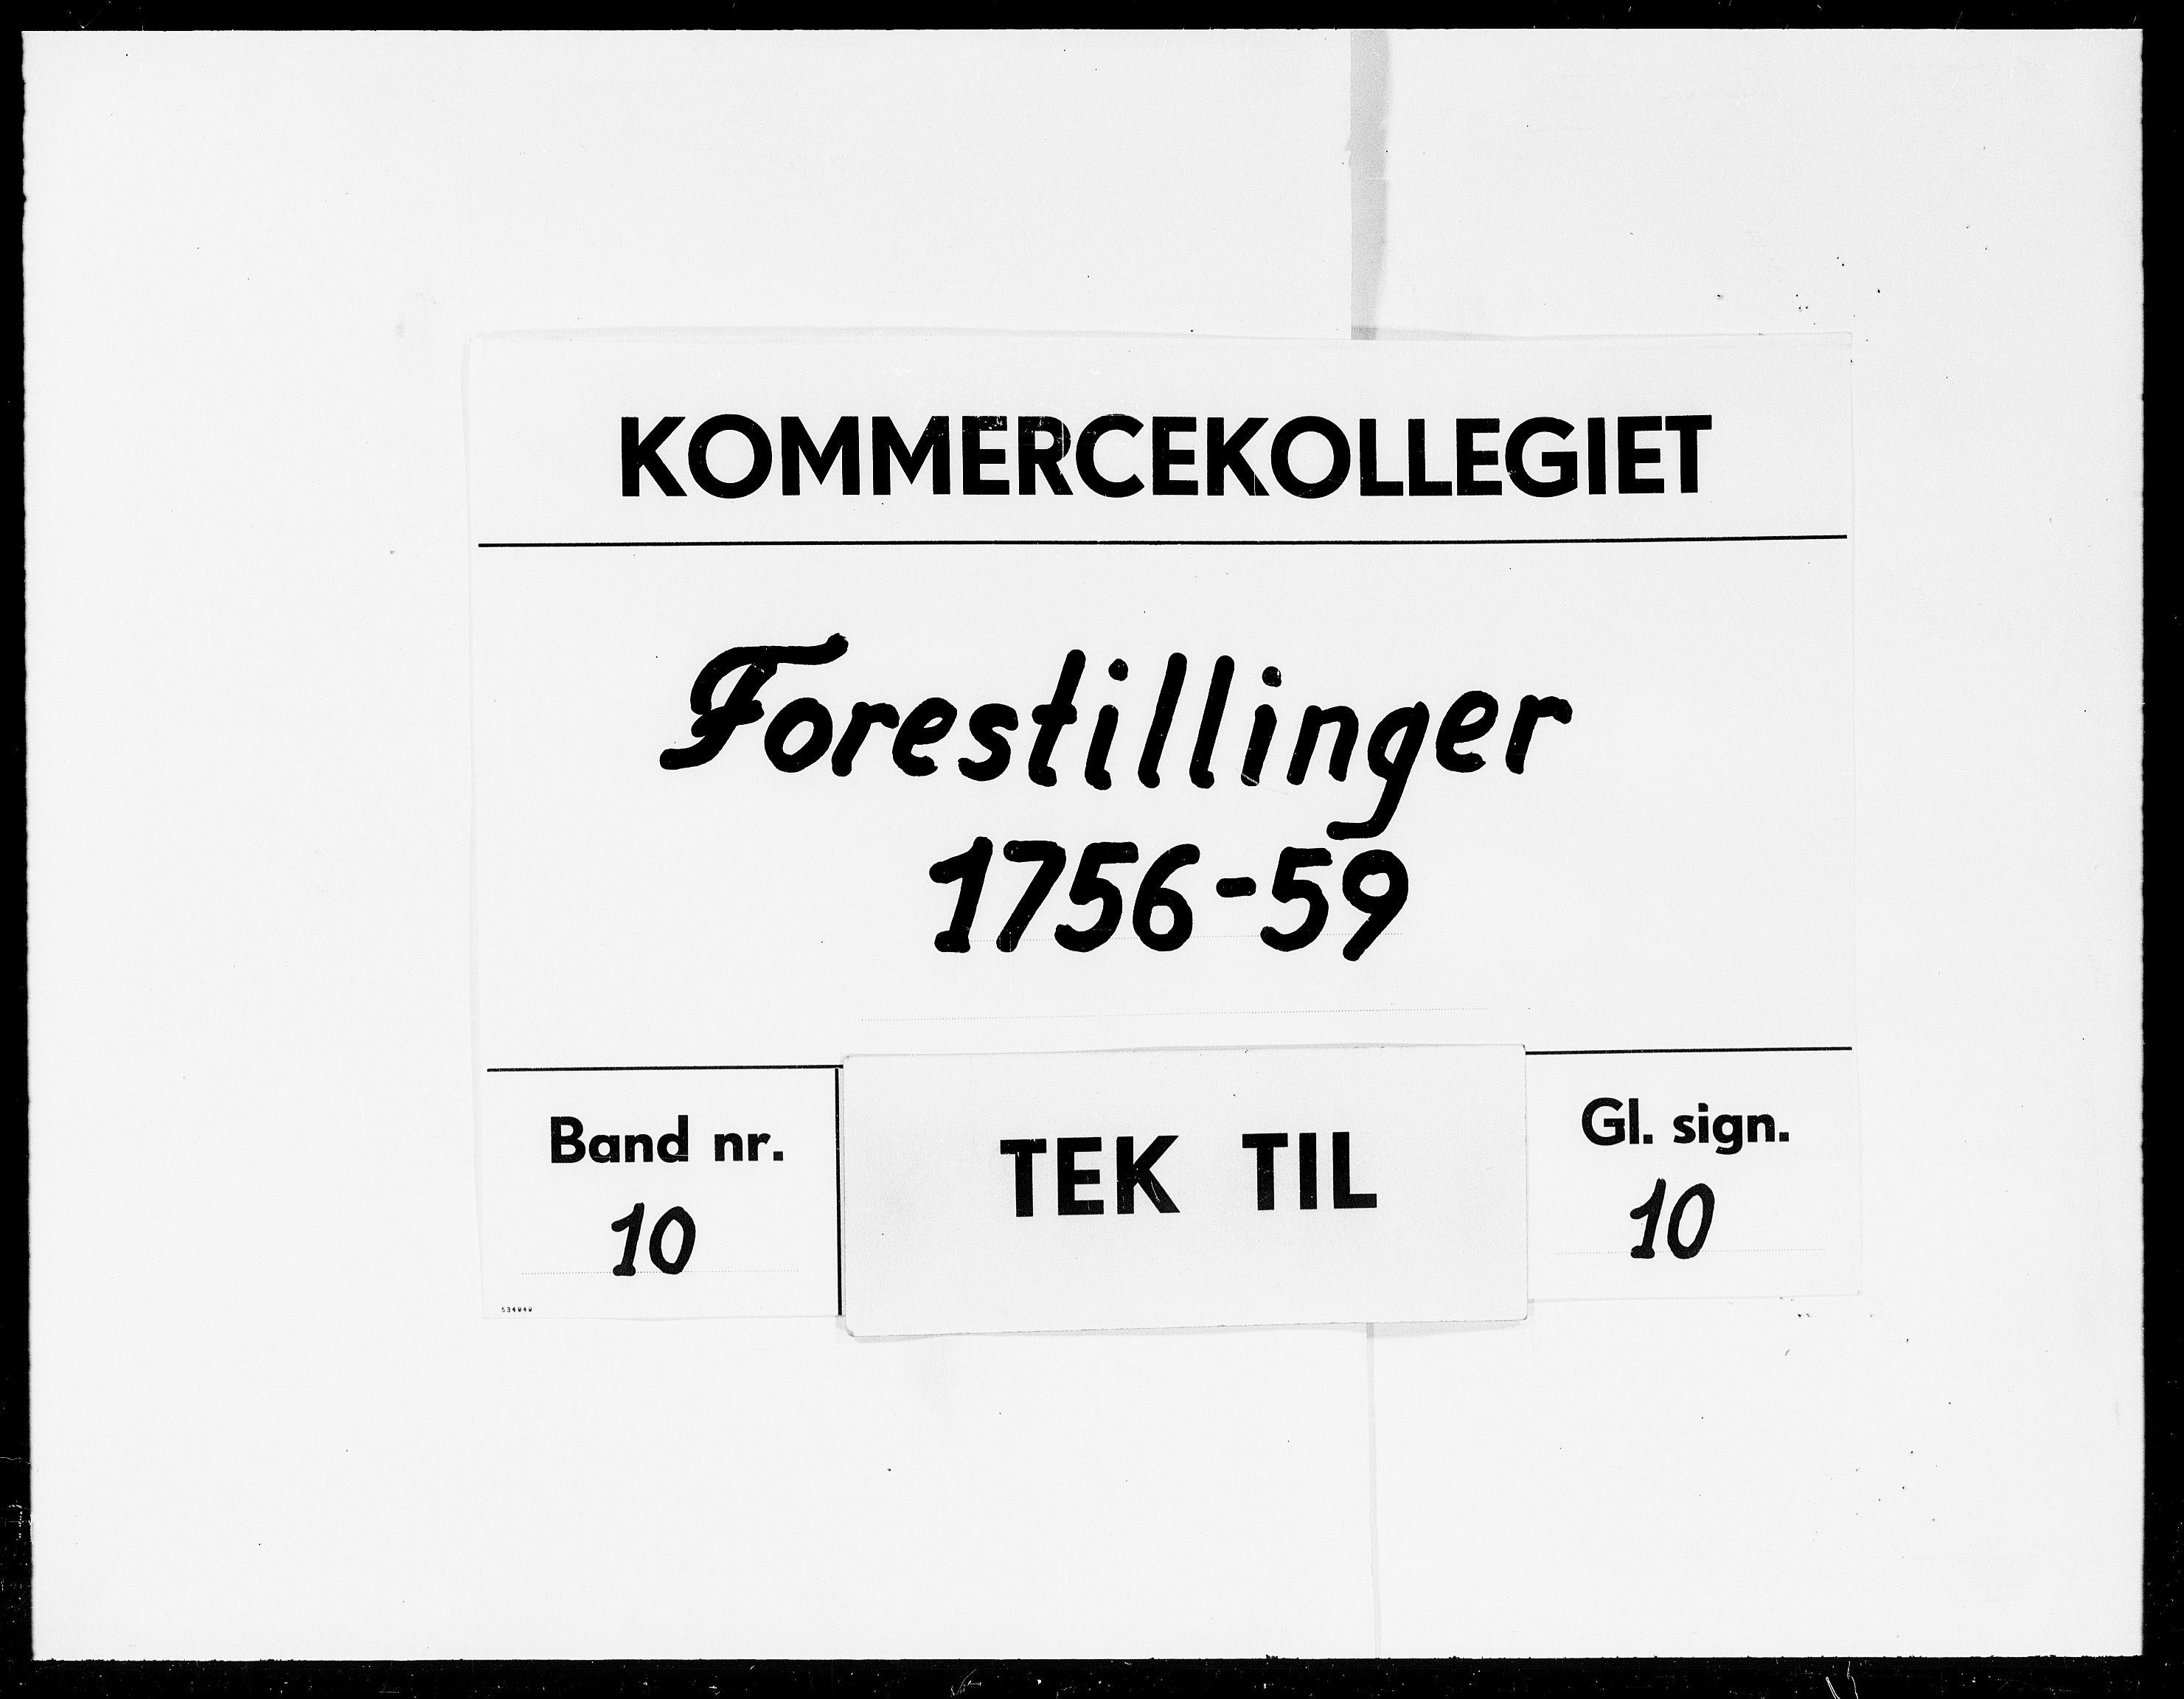 DRA, Kommercekollegiet, Dansk-Norske Sekretariat (1736-1771) / Kommercedeputationen (1771-1773), -/010: Forestillinger, 1756-1758